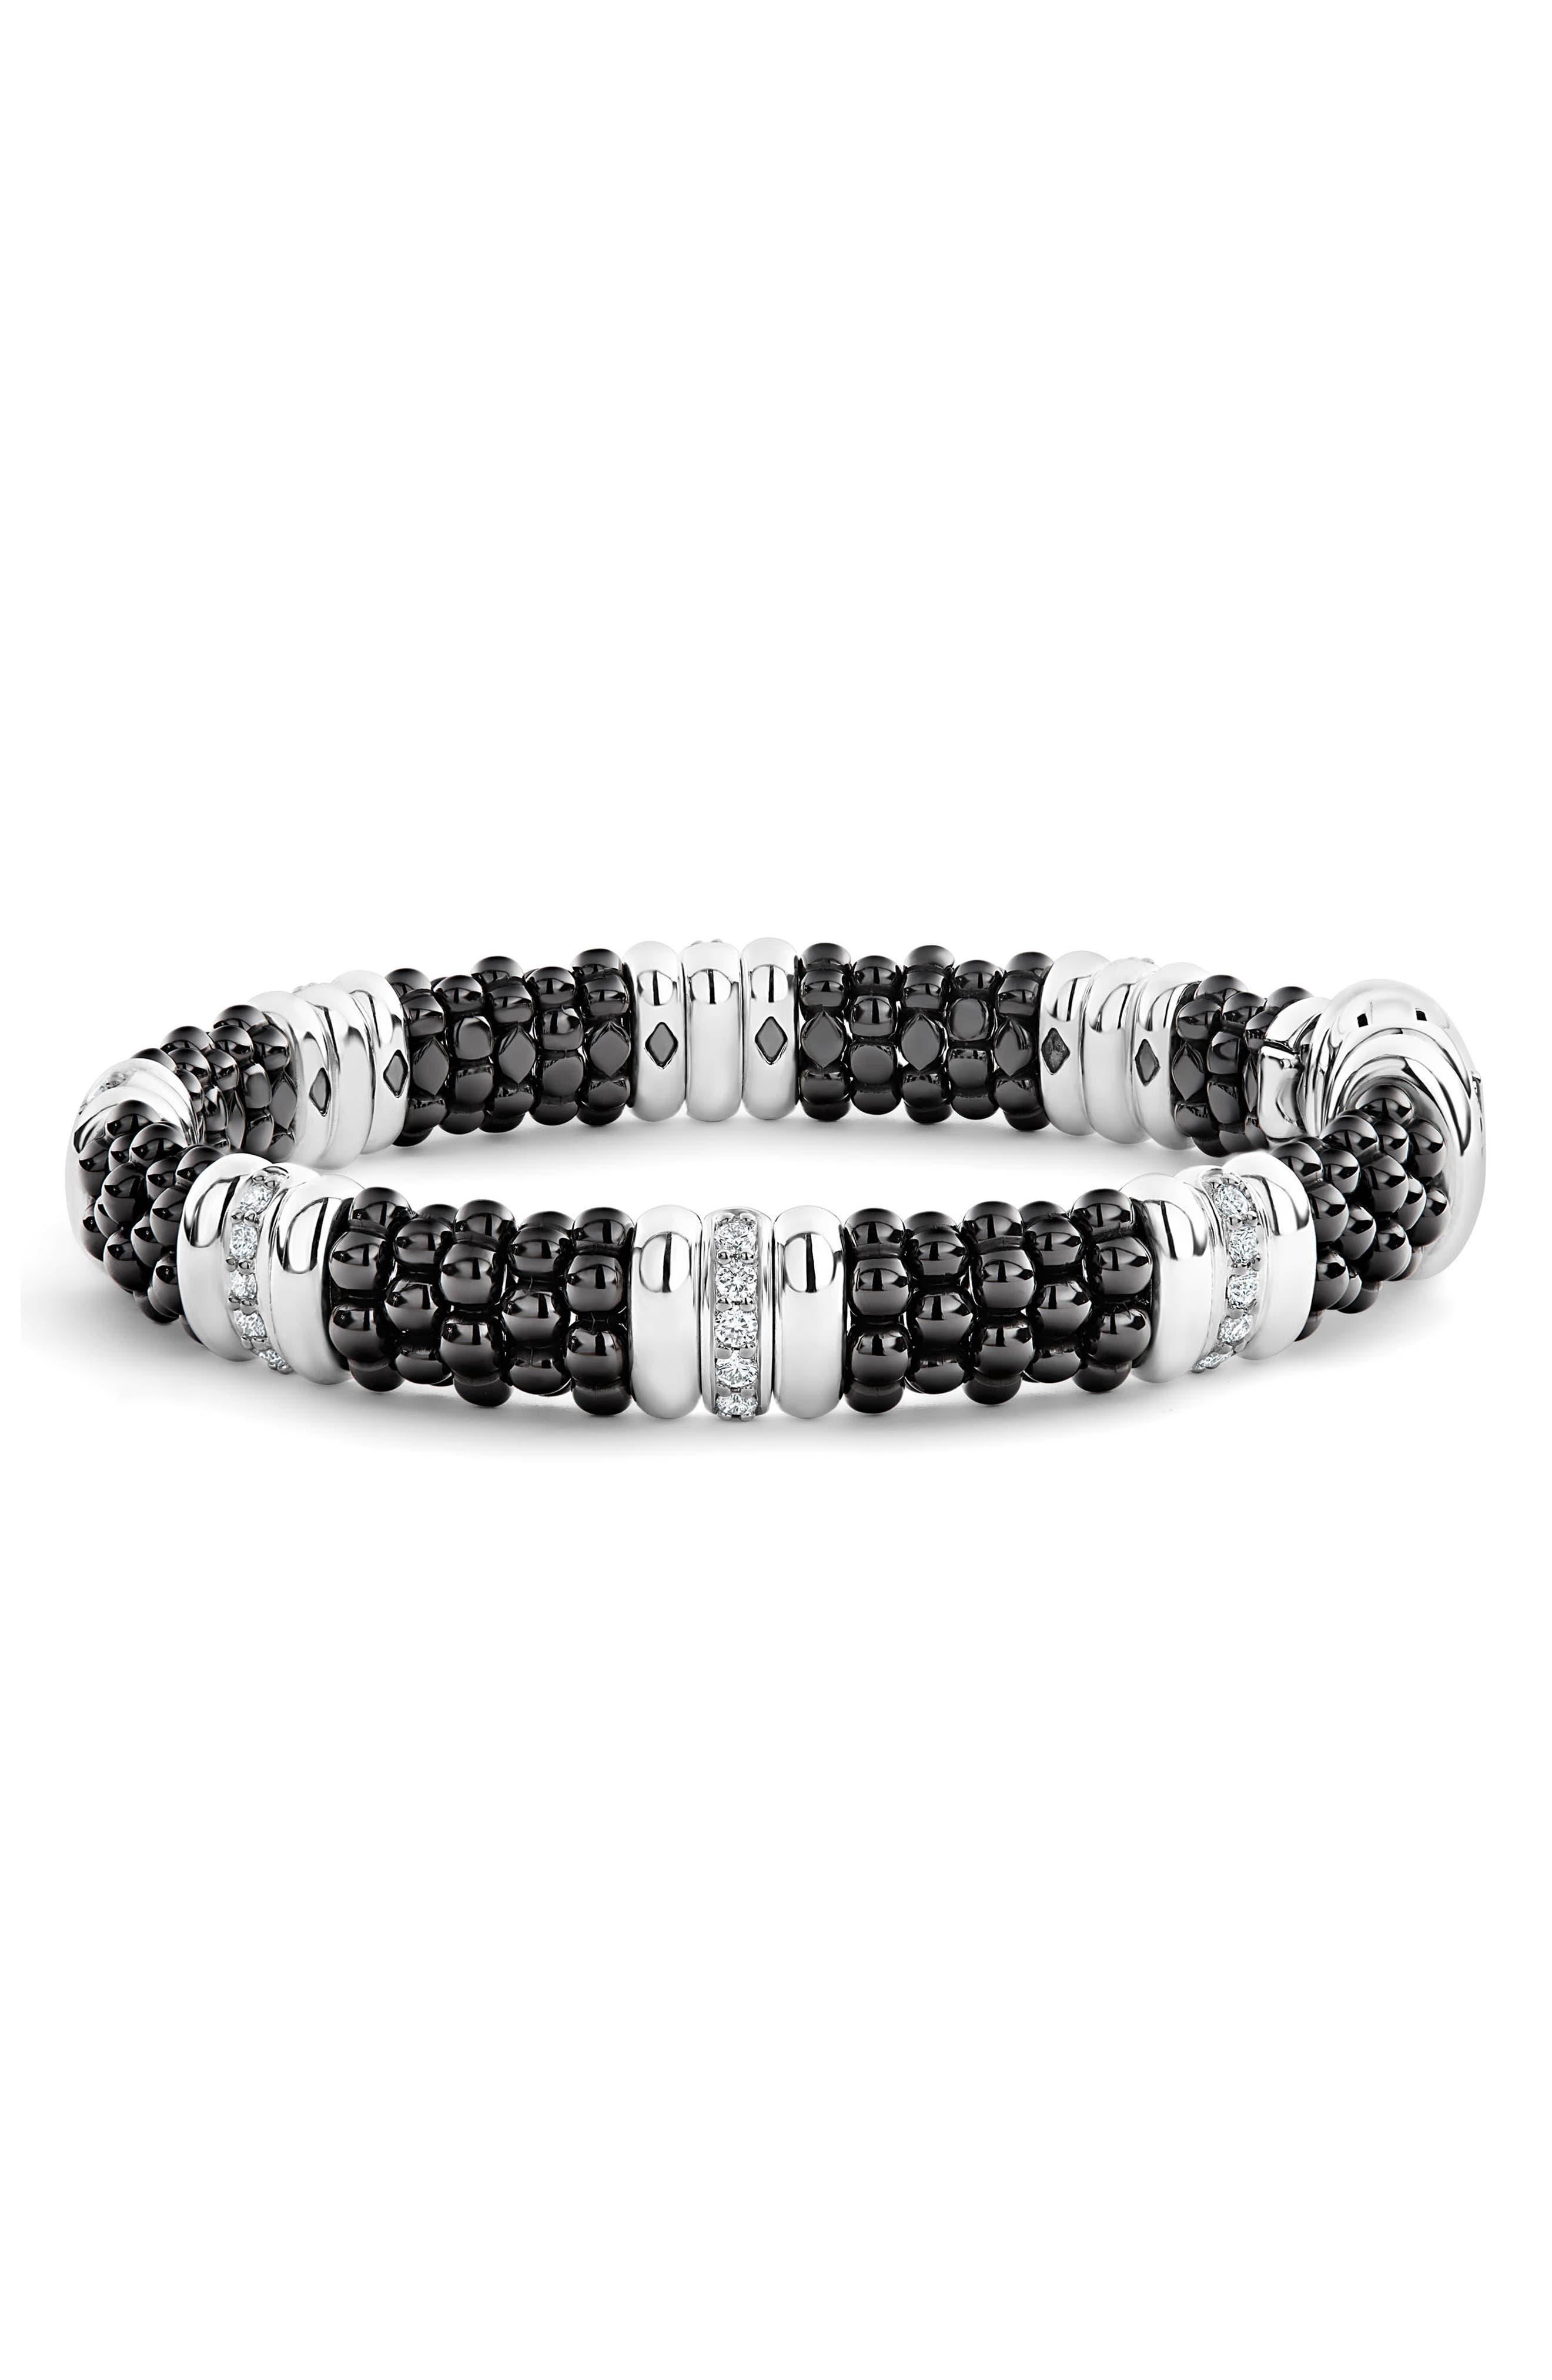 LAOGS Black Caviar Diamond 7-Link Bracelet,                             Alternate thumbnail 4, color,                             SILVER